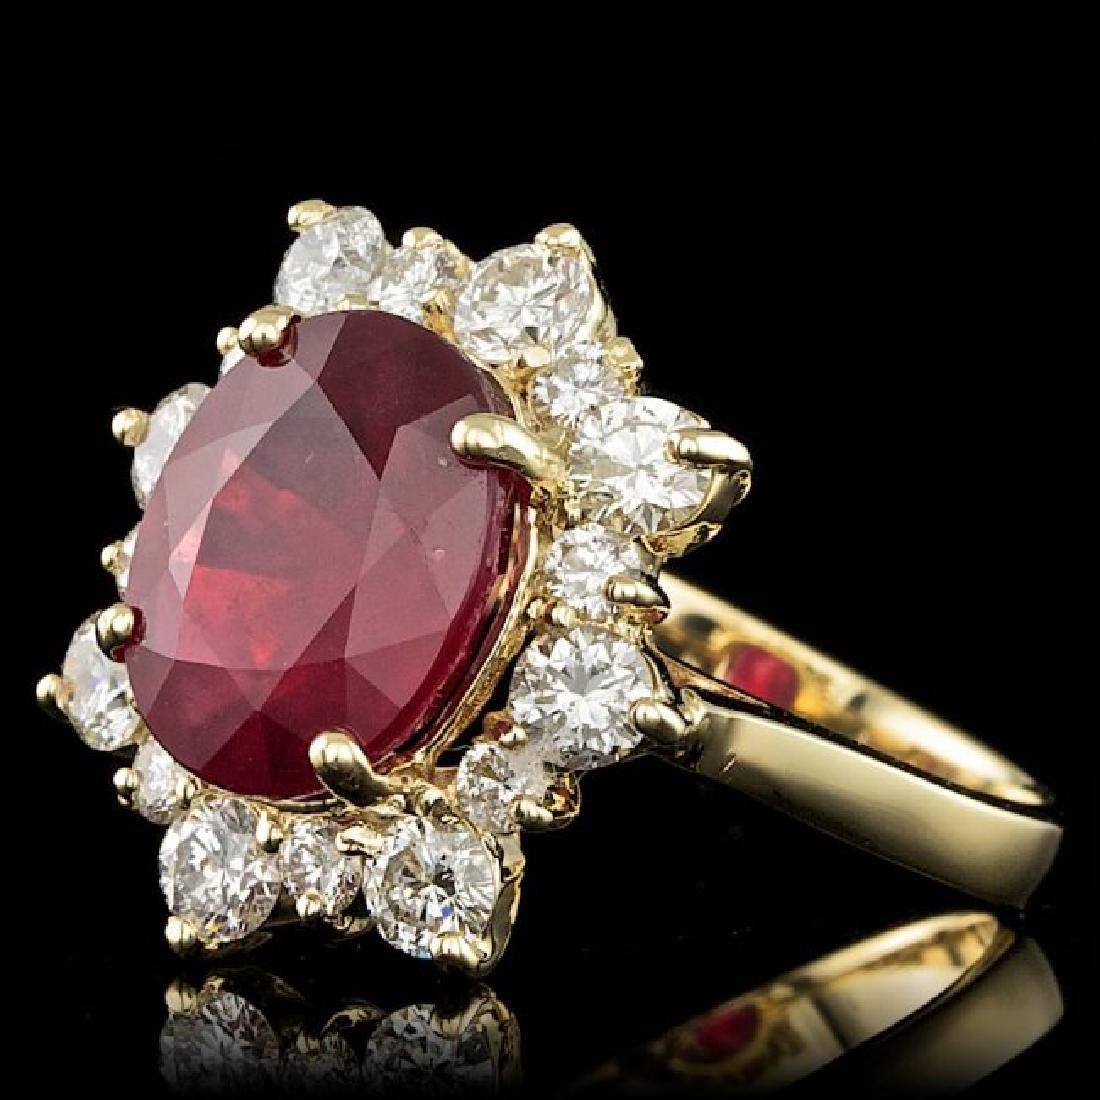 14k Yellow Gold 5.50ct Ruby 1.35ct Diamond Ring - 2